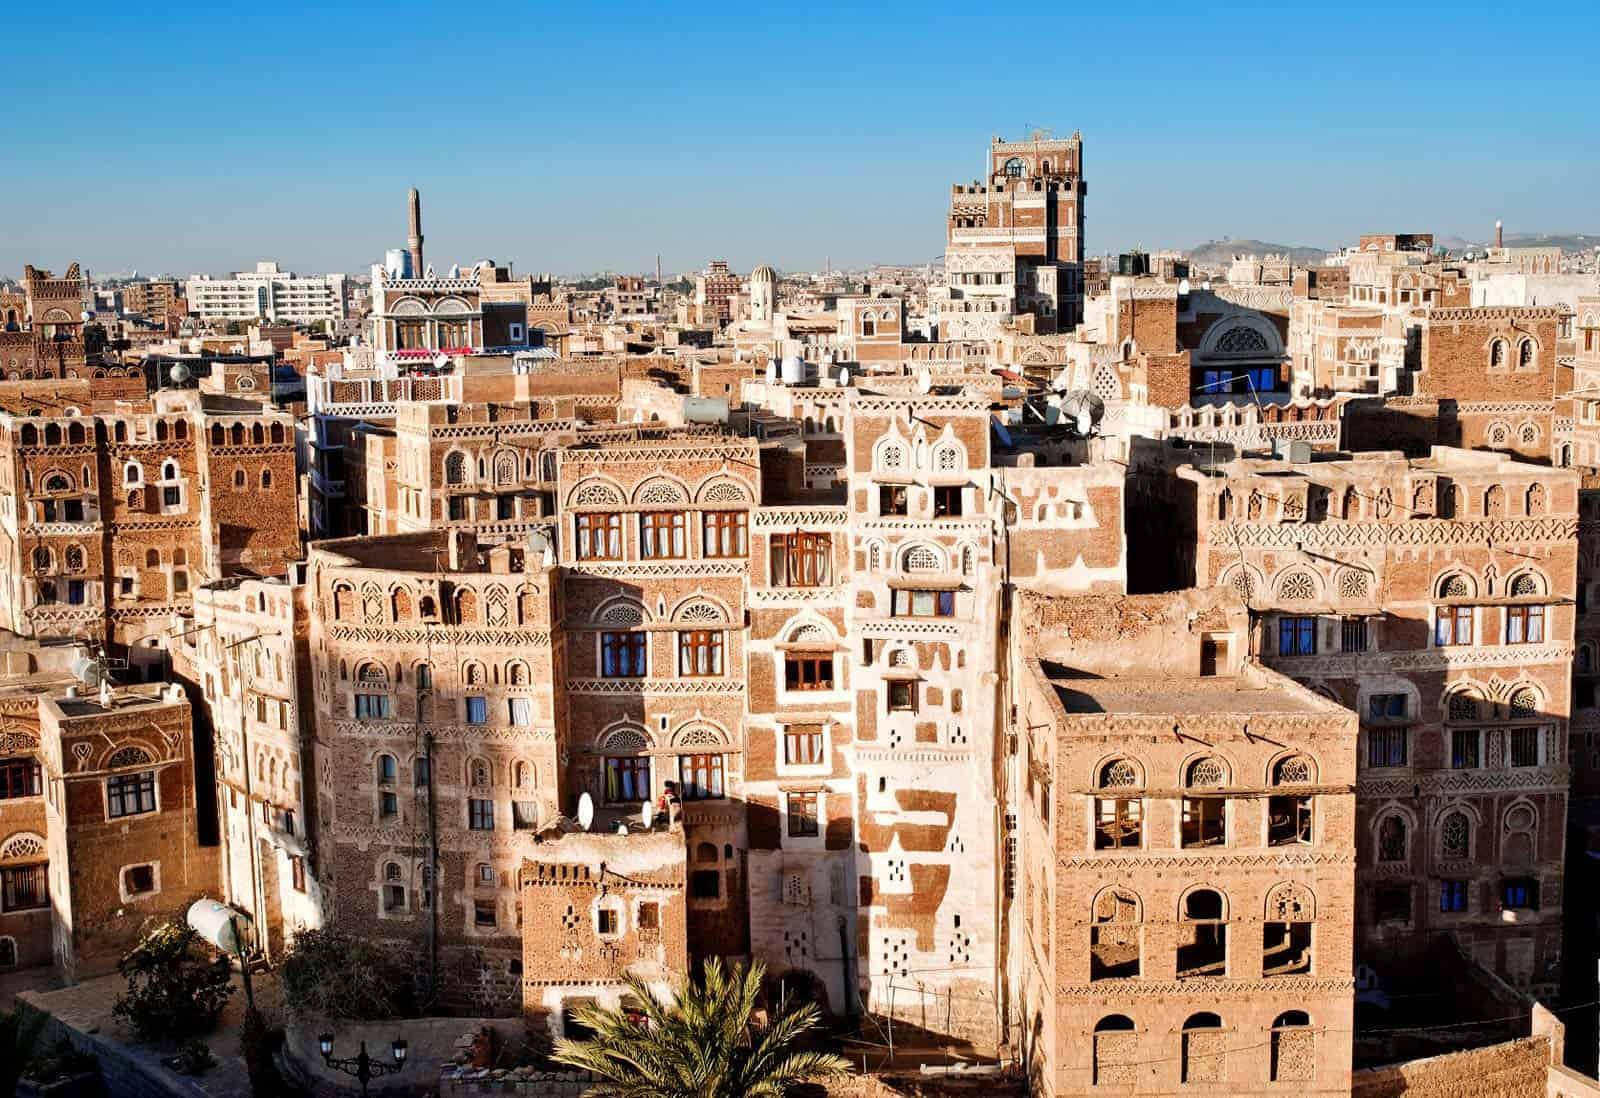 Arquitetura tradicional em Sanaa, Iémen